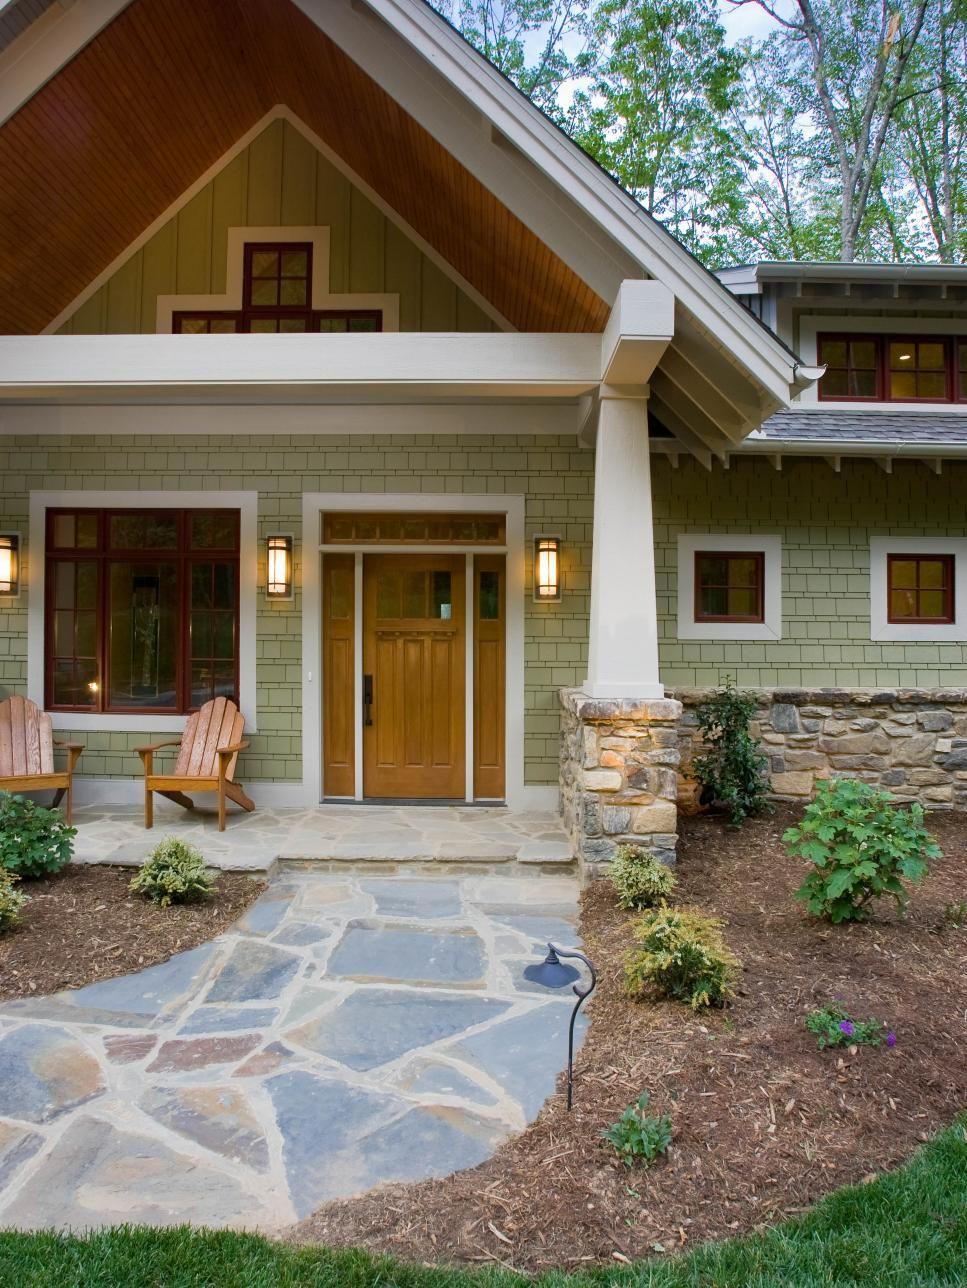 Df5411 esquemas de color casa exteriores con persianas negras - Df5411 Esquemas De Color Casa Exteriores Con Persianas Negras 29